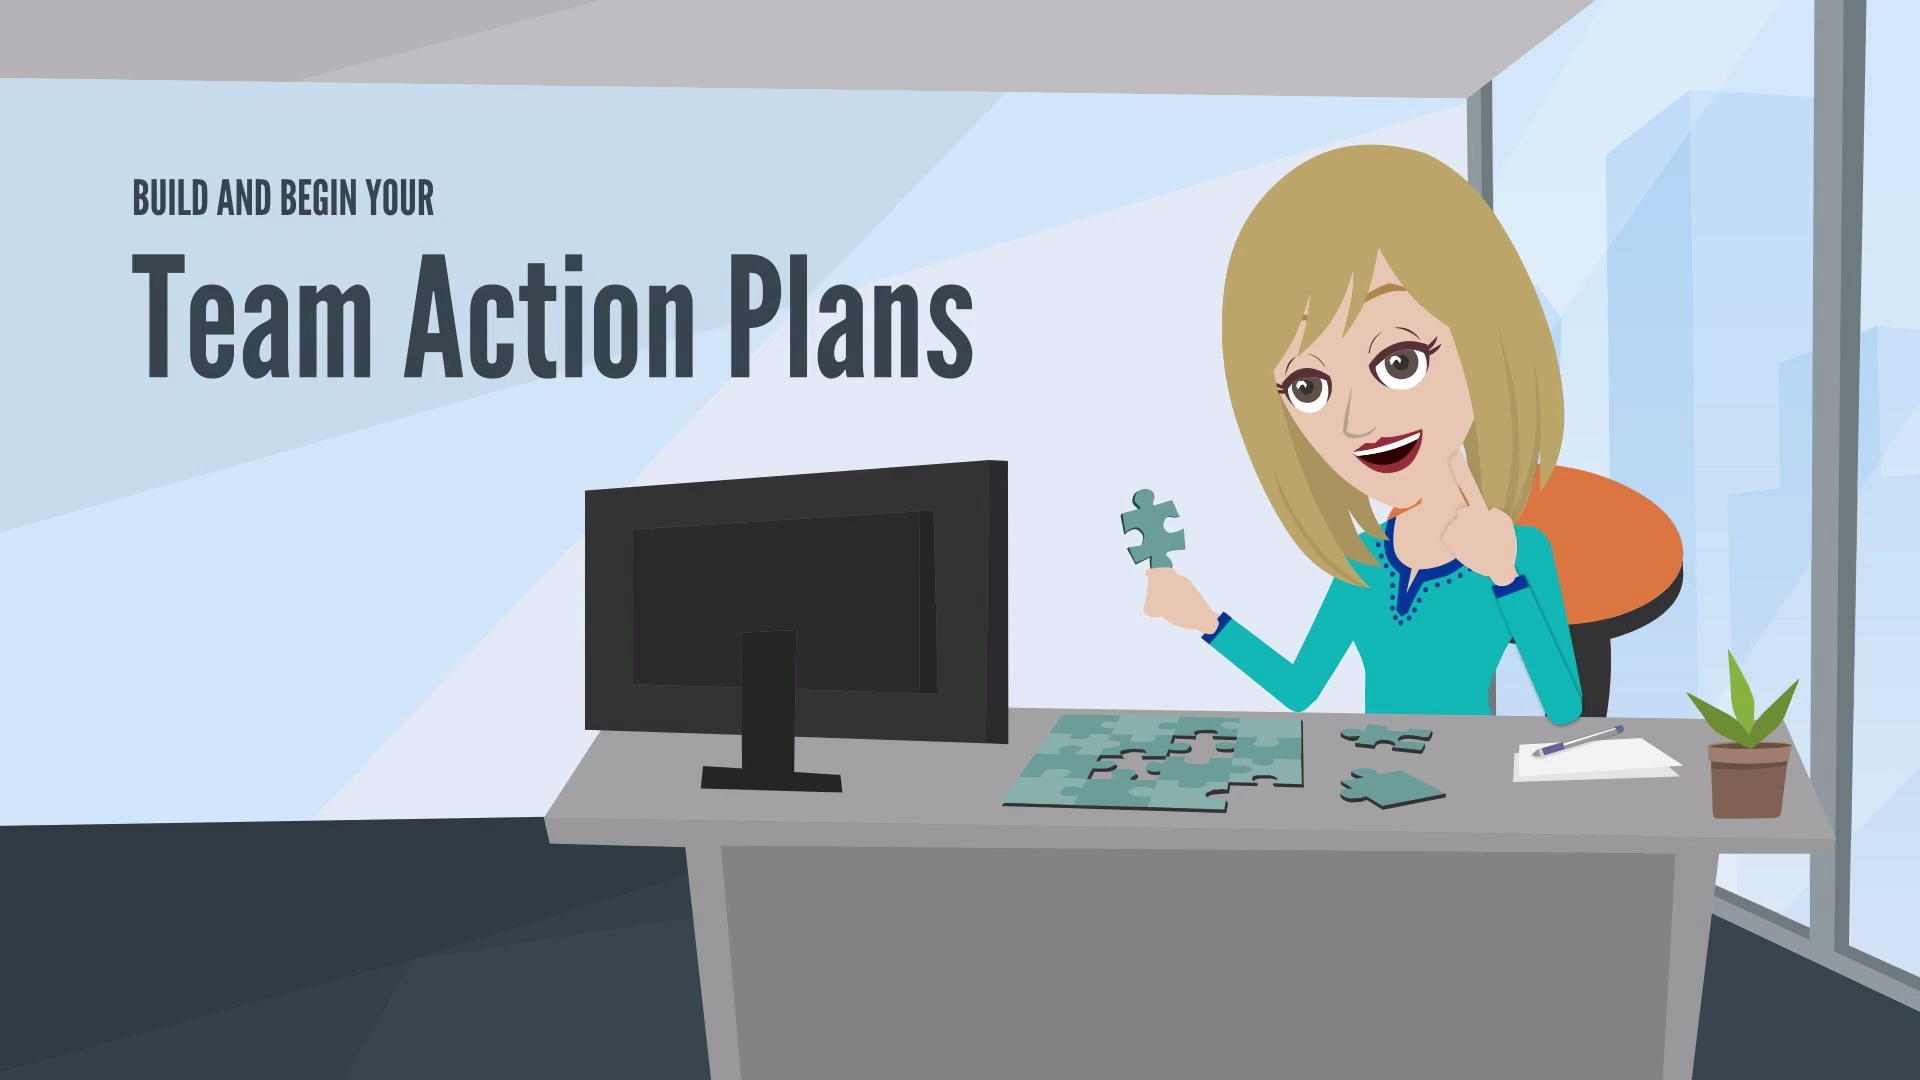 Team action plans